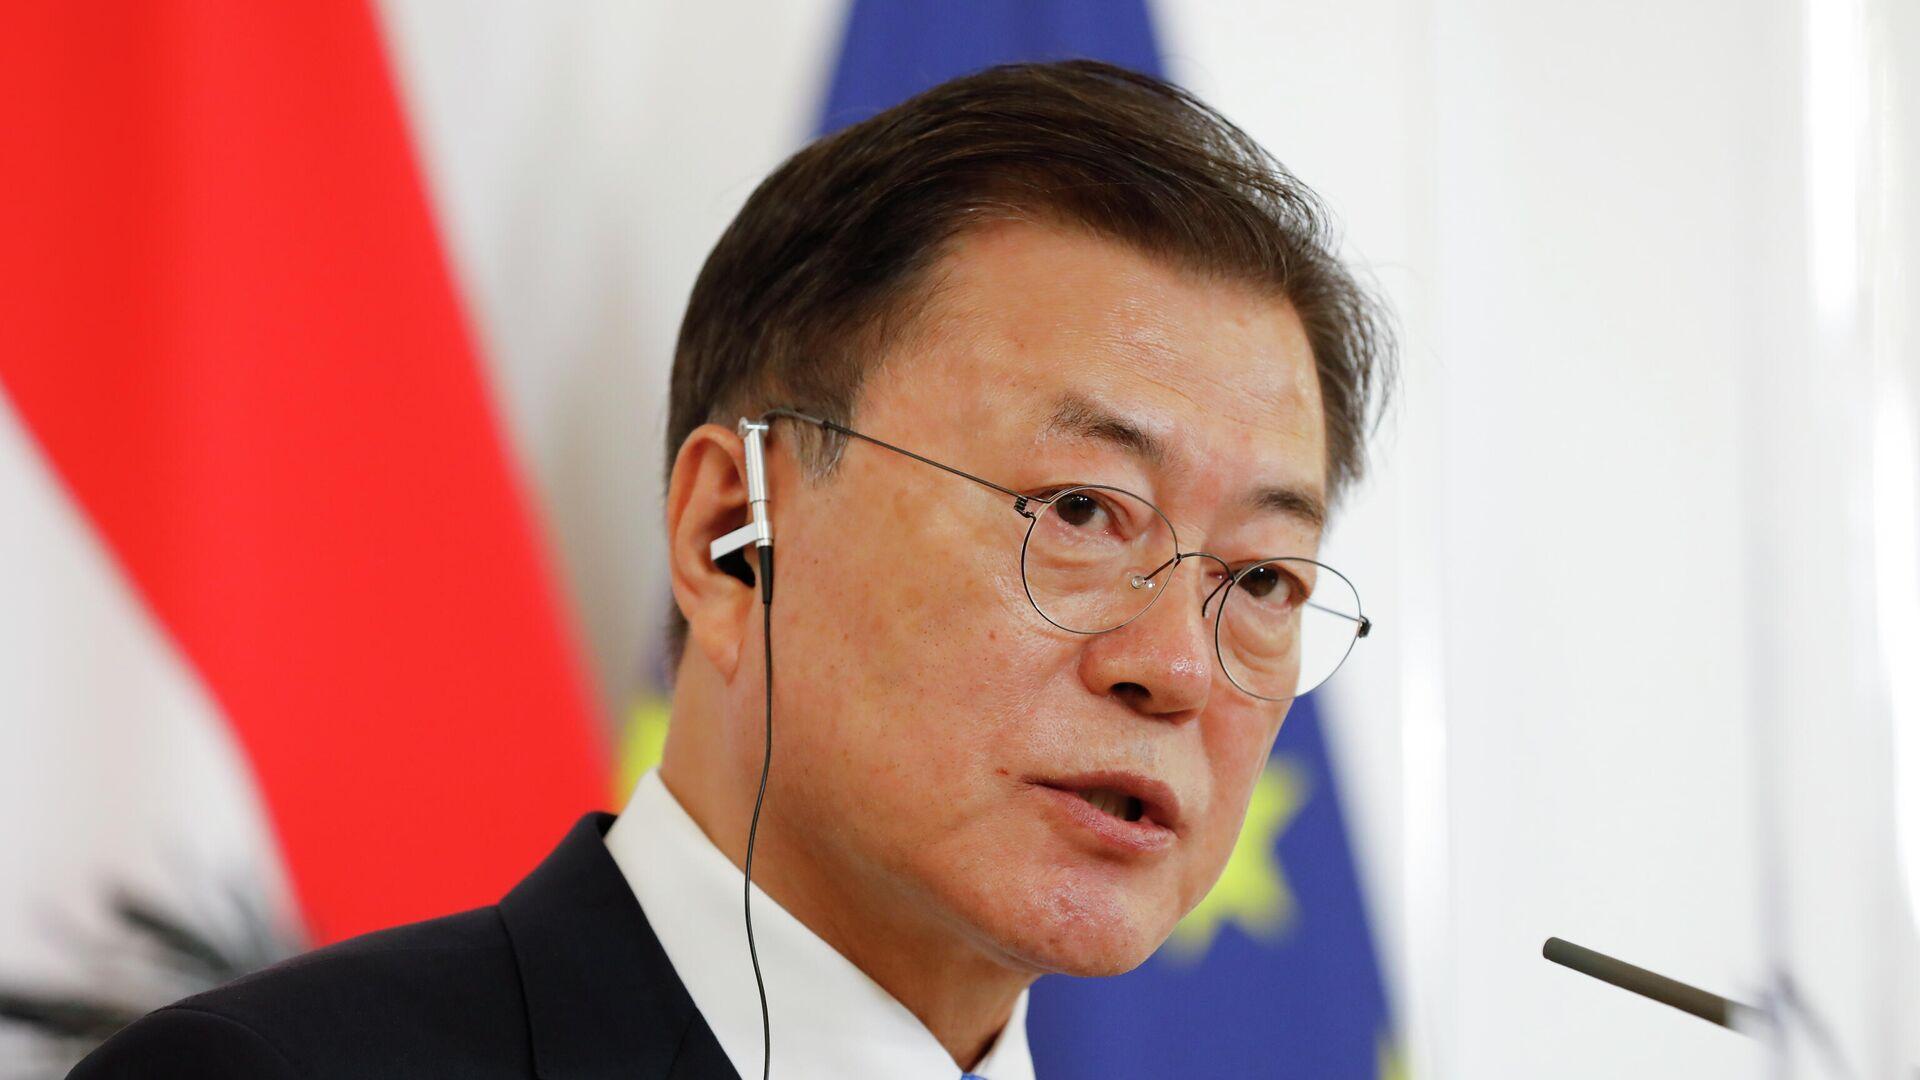 Moon Jae-in, presidente de Corea del Sur - Sputnik Mundo, 1920, 18.07.2021